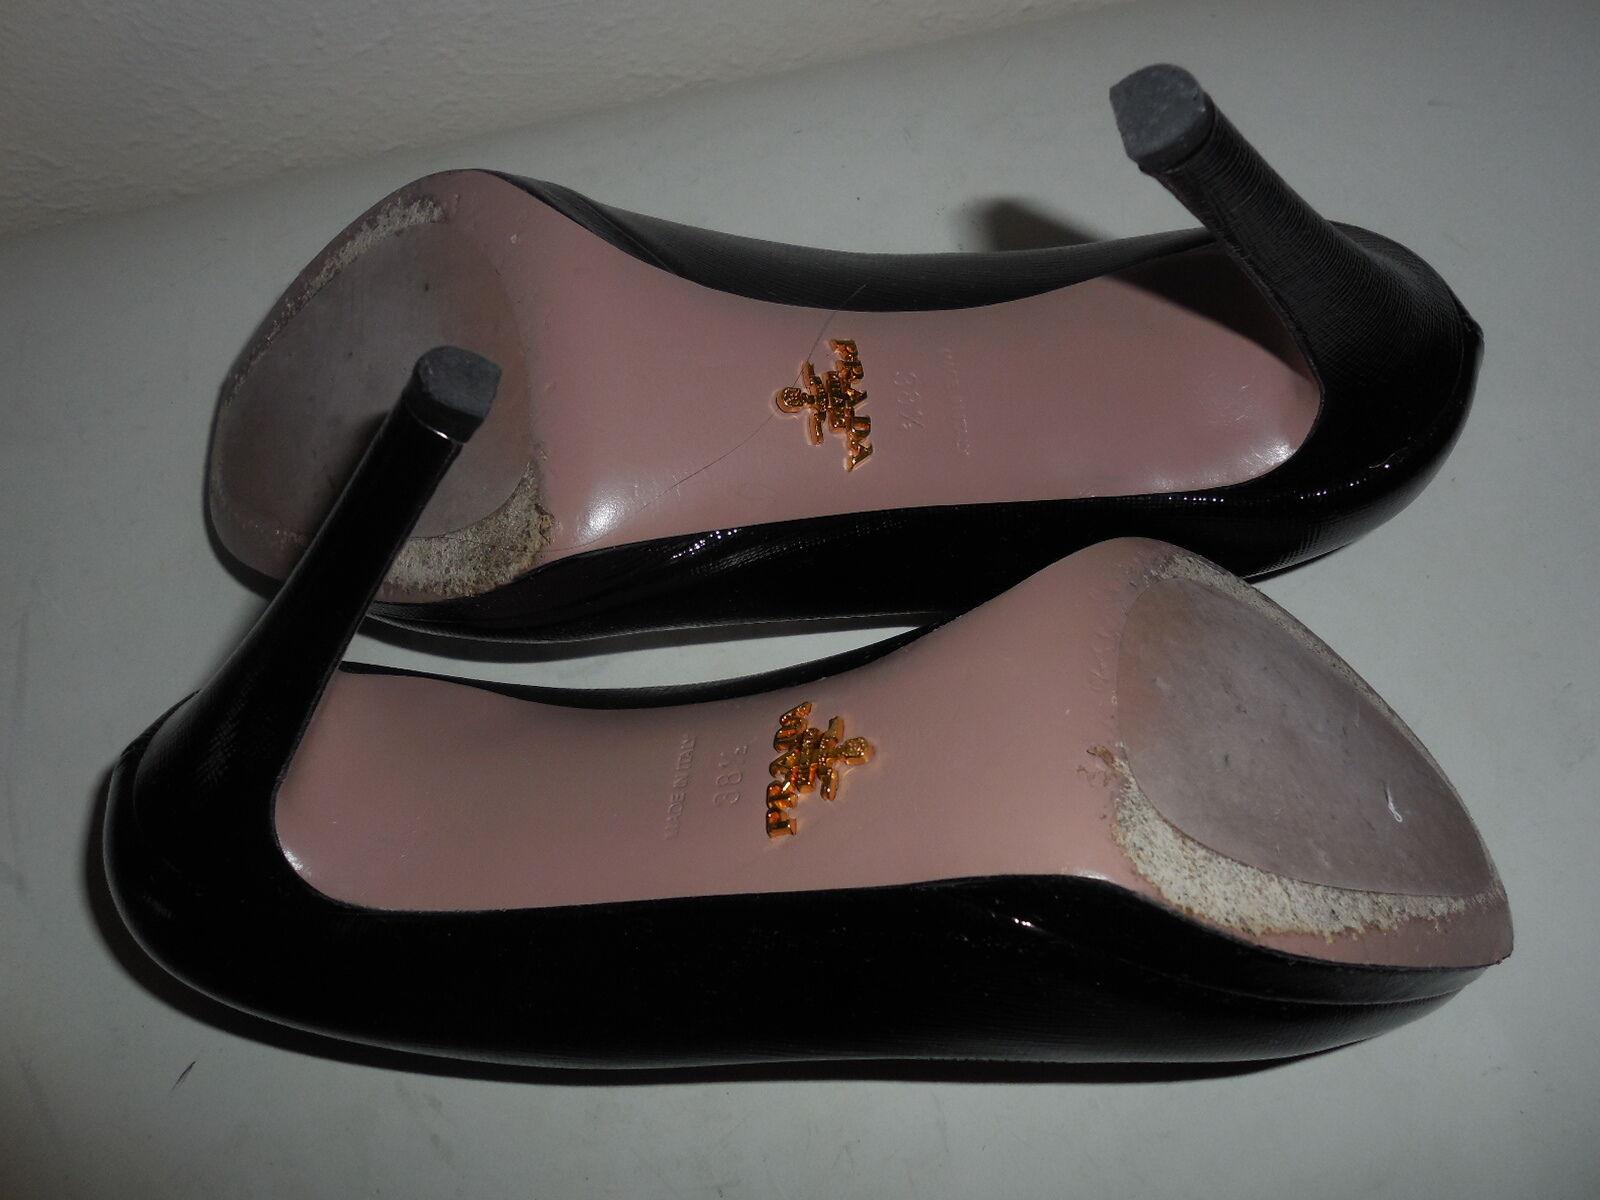 Sz. 8.5 Prada Saffiano Patent Leather Almendras Toe Platform Bombas tacón Zapatos de tacón Bombas negro f6857c